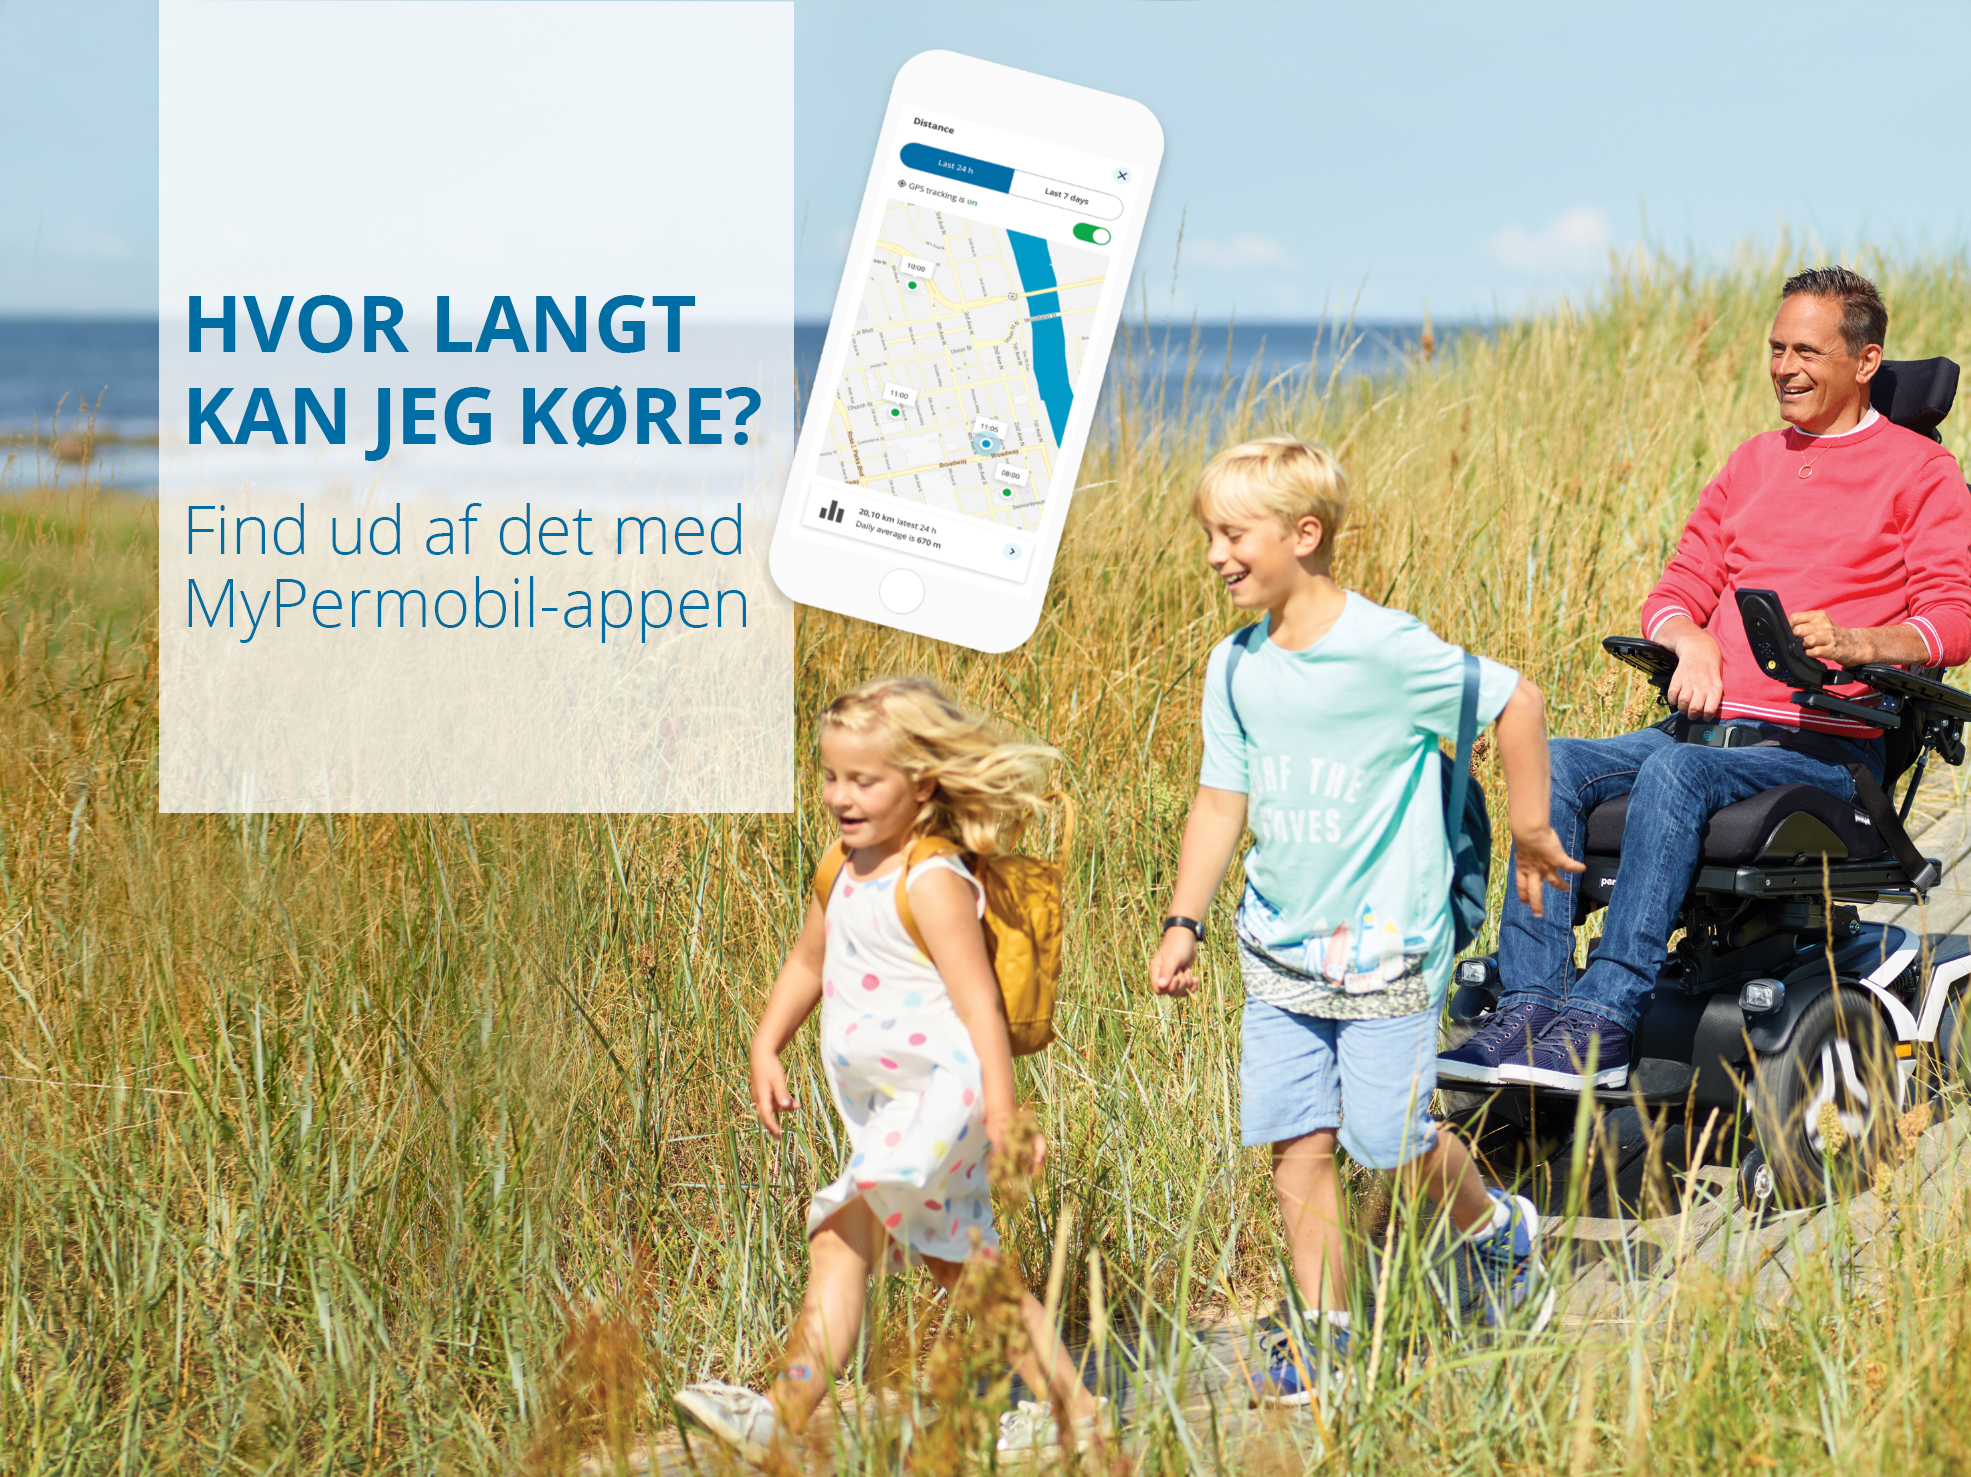 Landing-page-image_Summer_DK